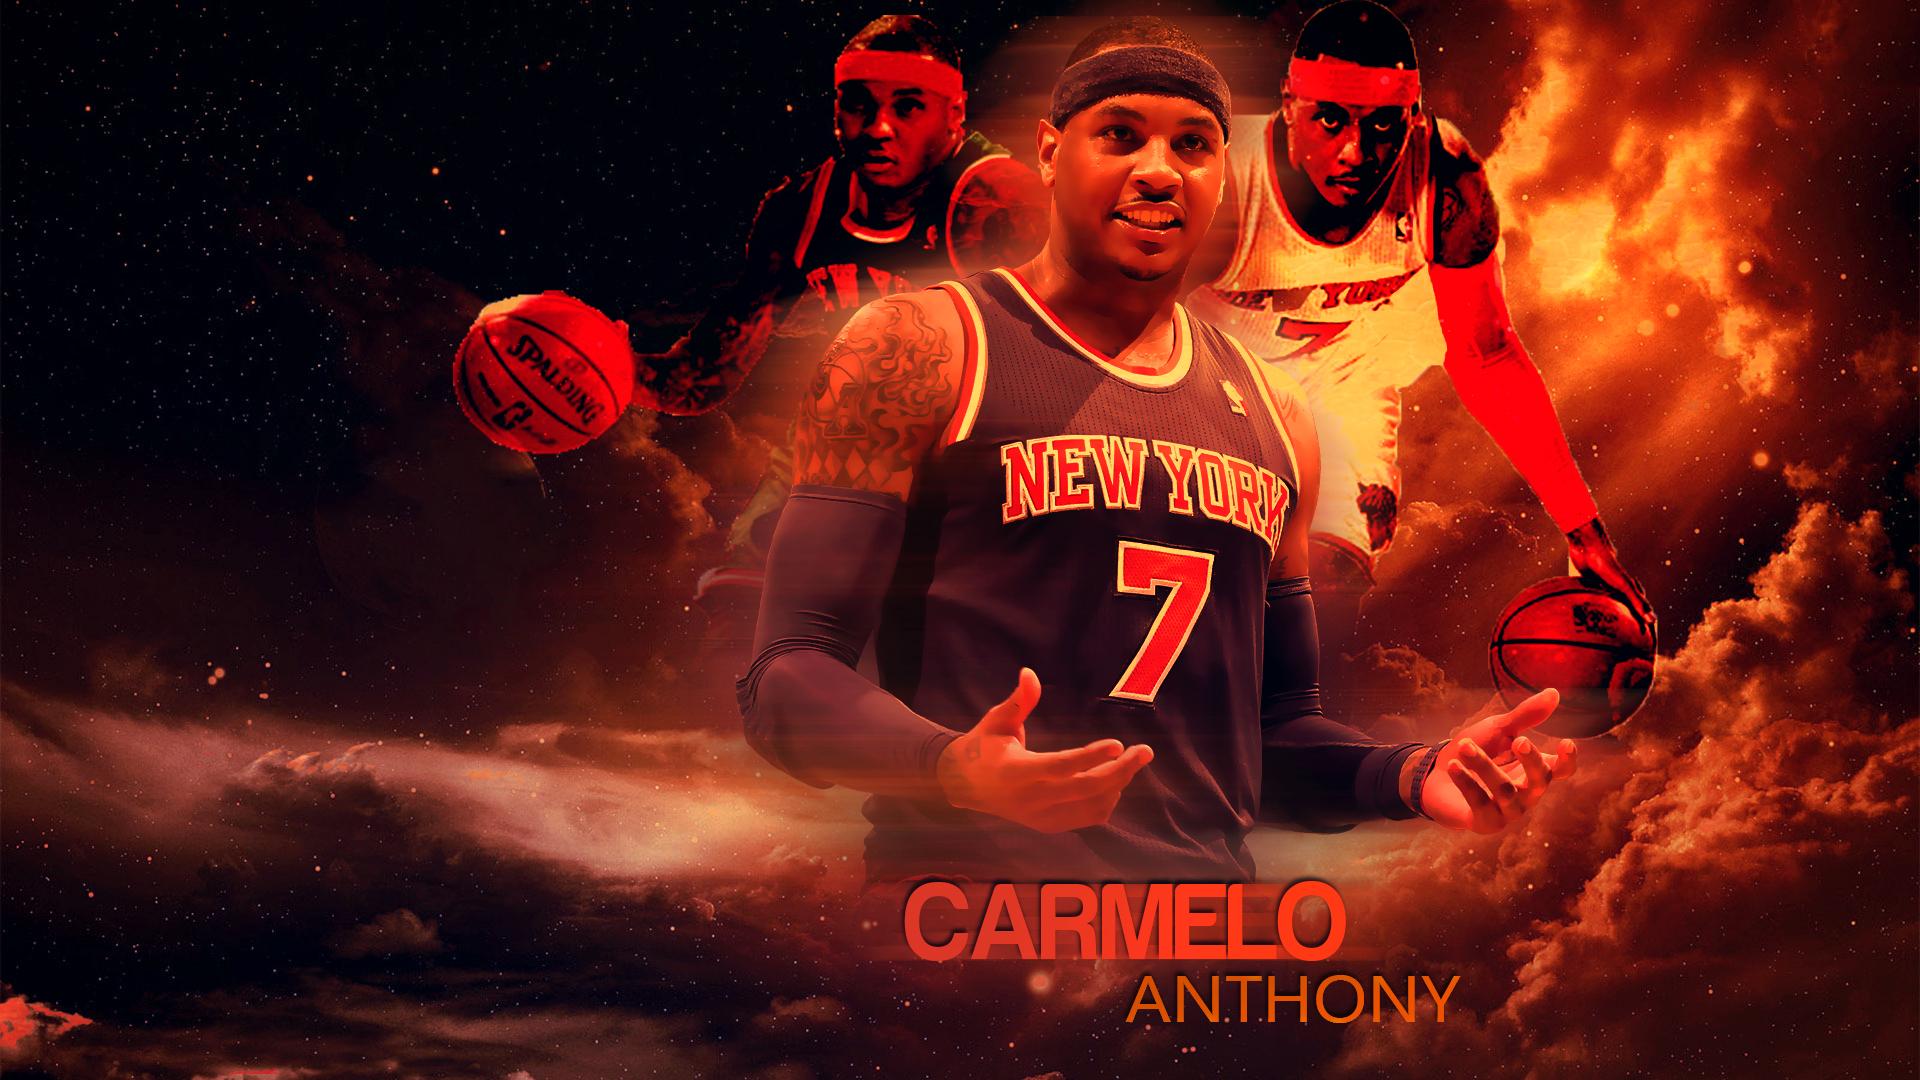 Carmelo anthony 2014 wallpaper by rakagfx on deviantart carmelo anthony 2014 wallpaper by rakagfx carmelo anthony 2014 wallpaper by rakagfx voltagebd Images